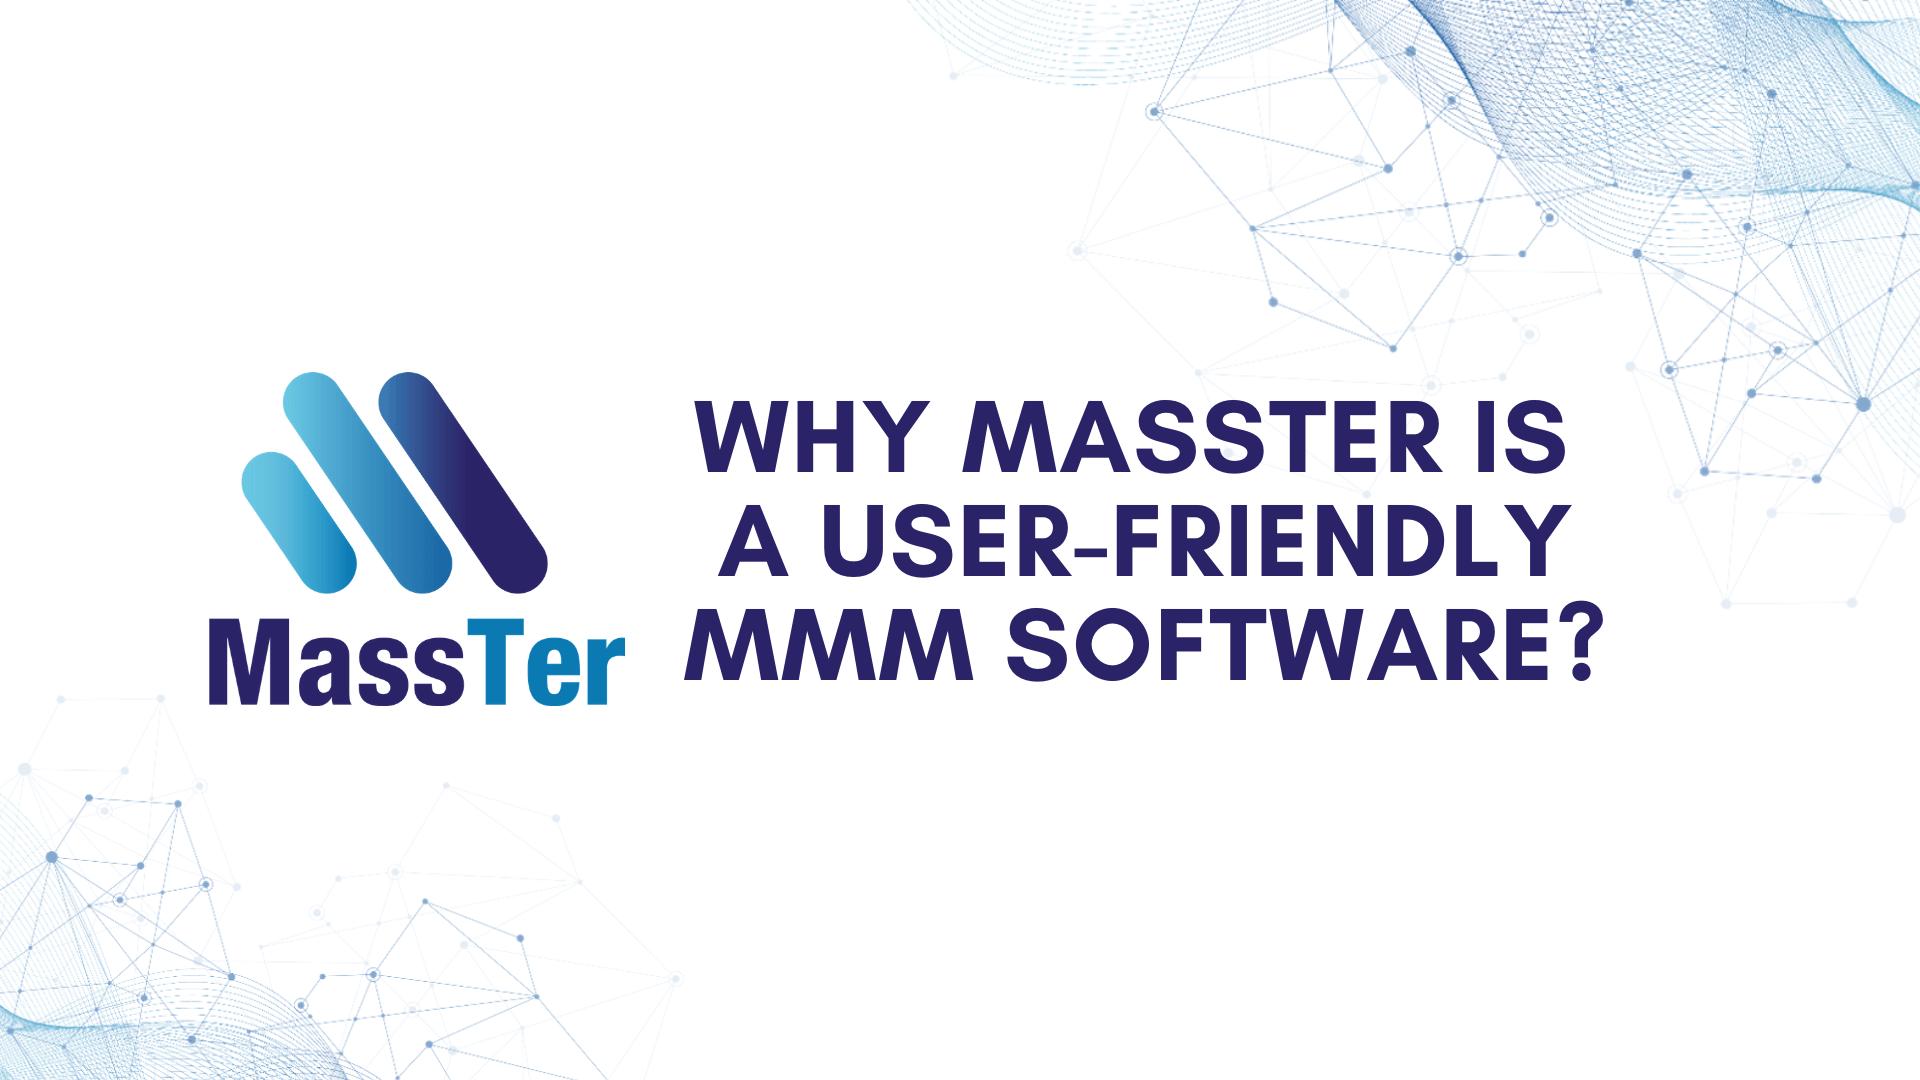 User-Friendly MMM Software